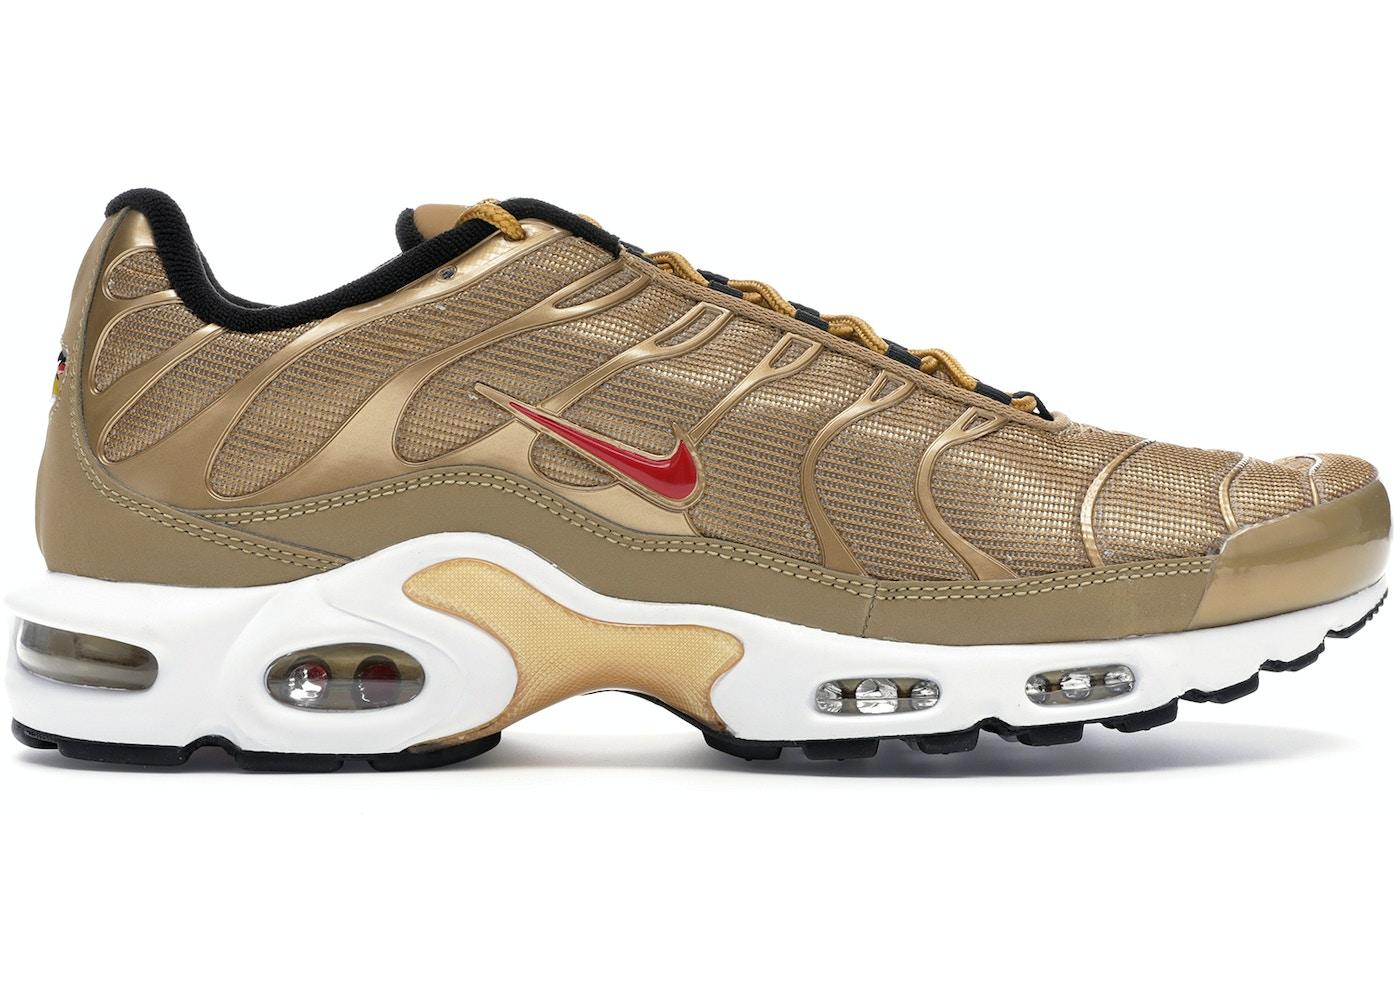 feo Rancio Relativamente  Nike Air Max Plus Metallic Gold (2018) - 903827-700